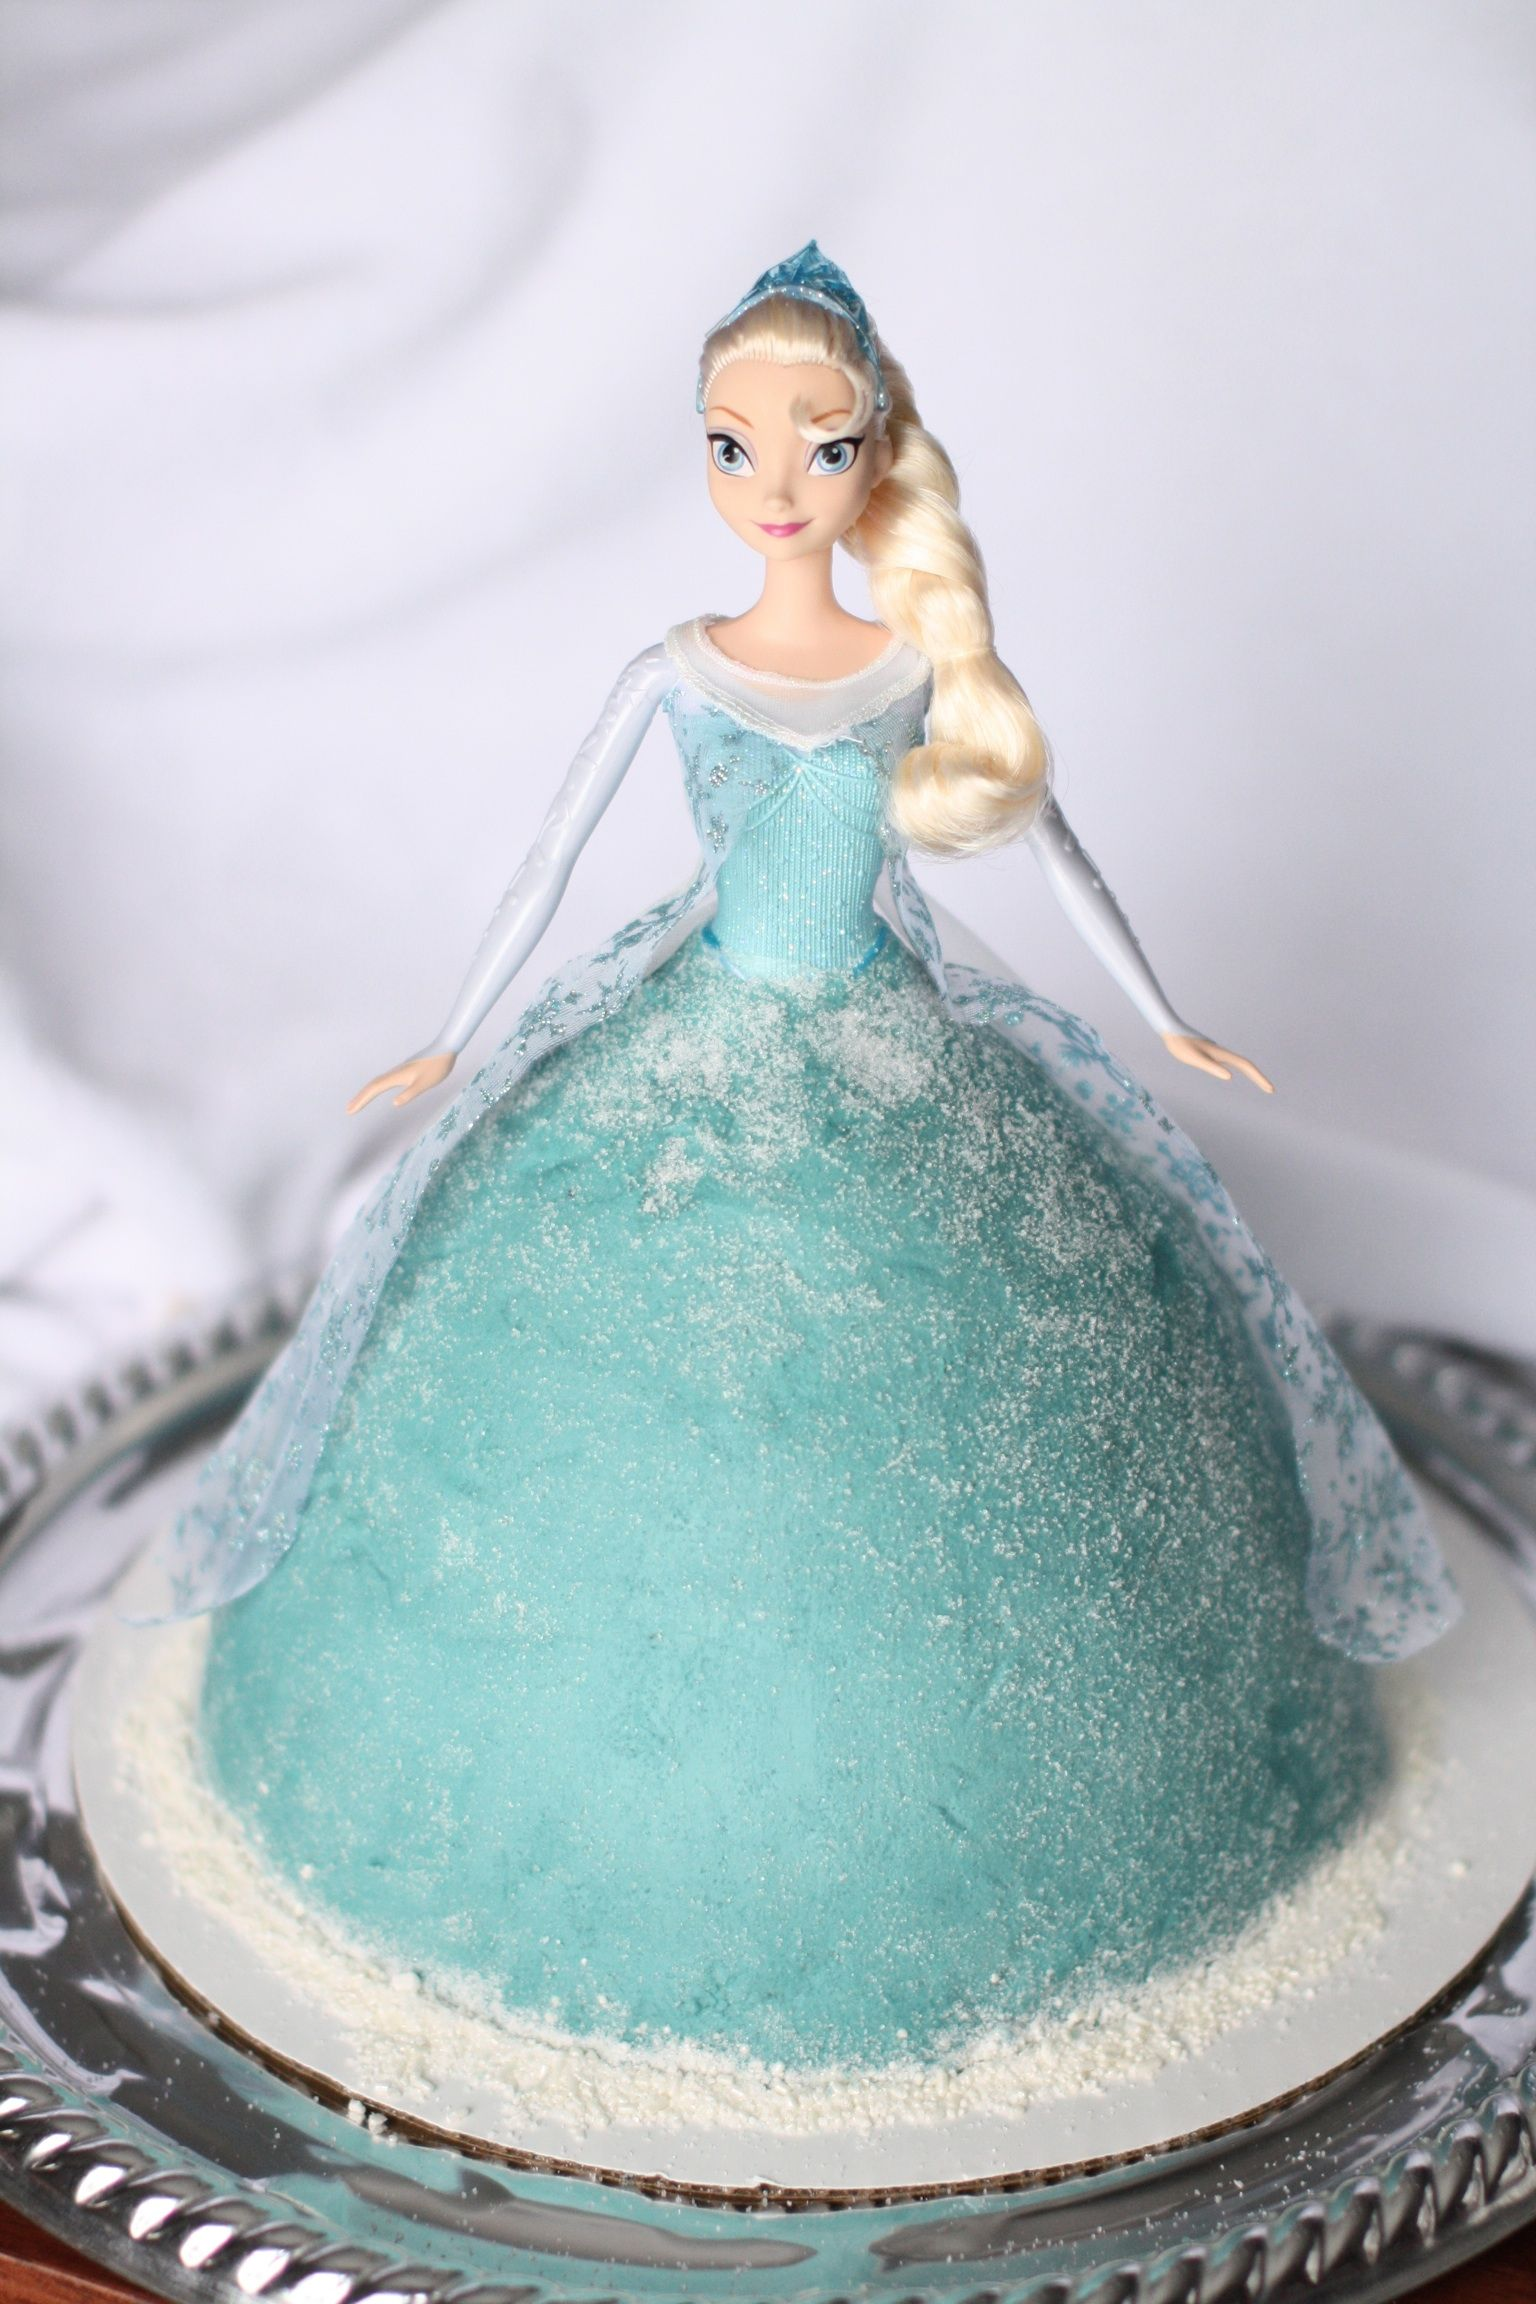 Festa Frozen Elsa cakes Disney frozen elsa and Elsa